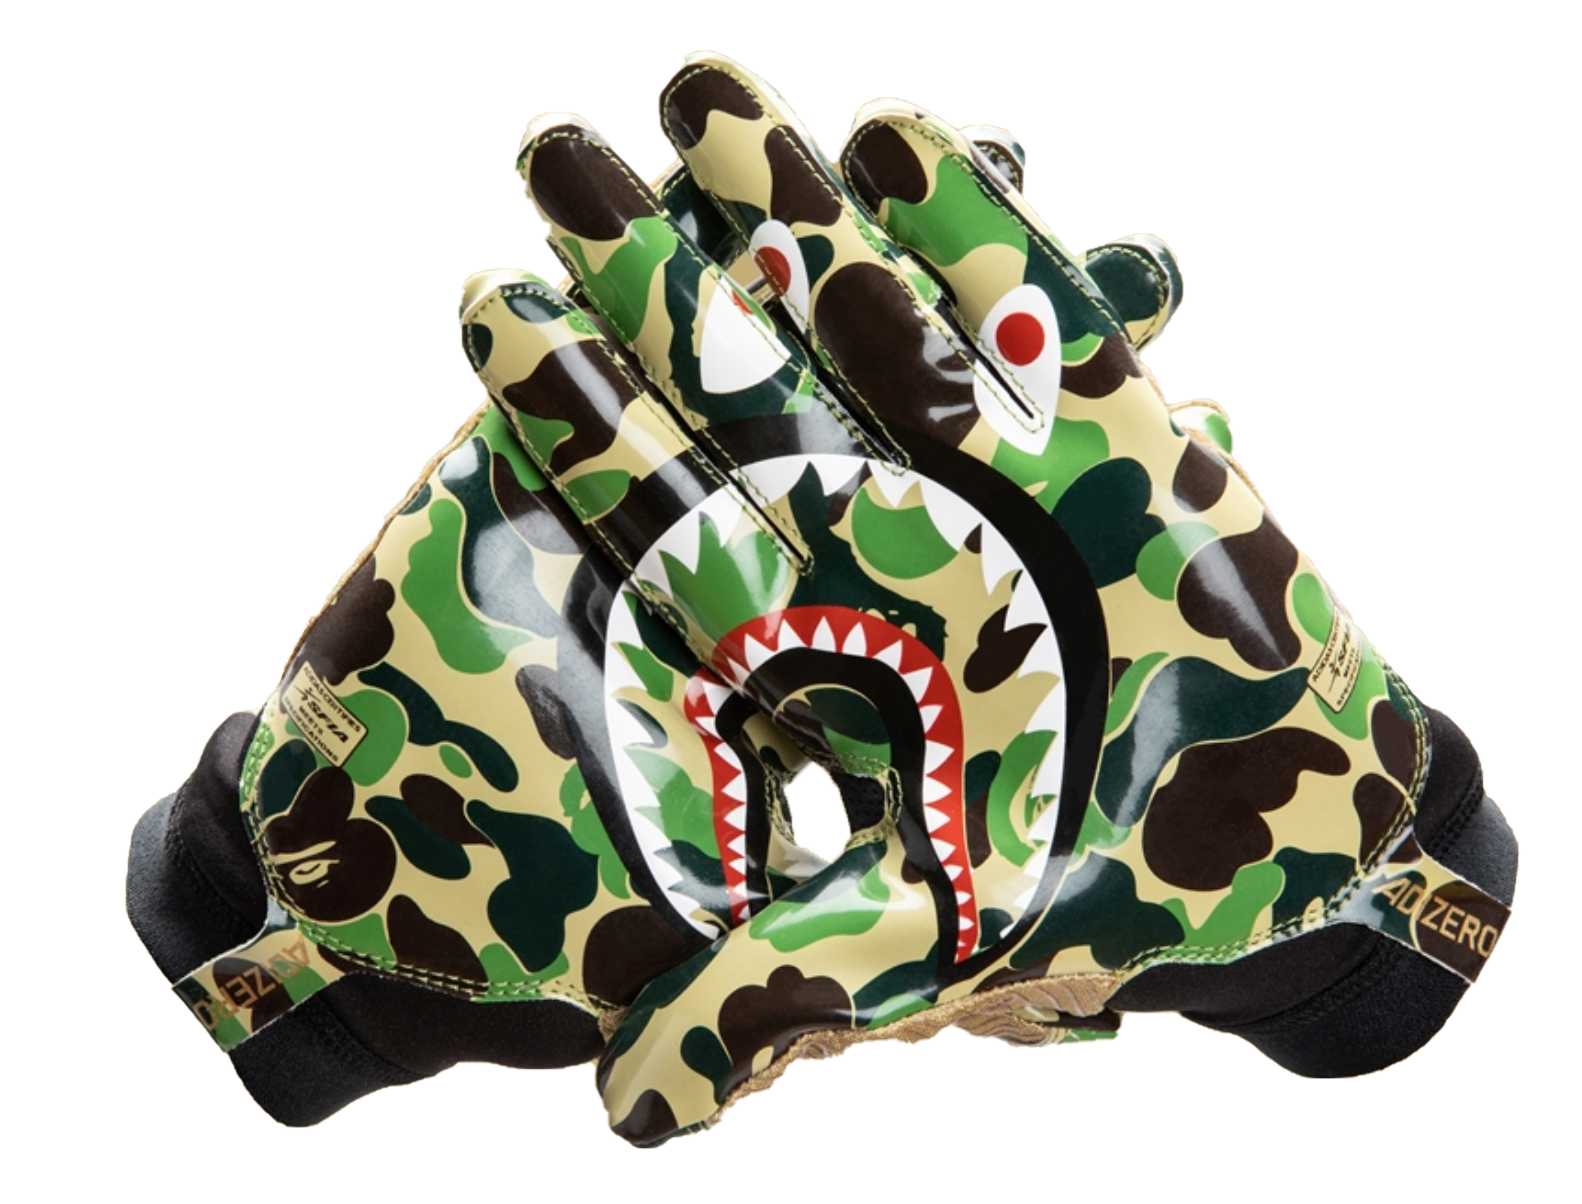 BAPE x Adidas Adizero 8.0 Gloves Green